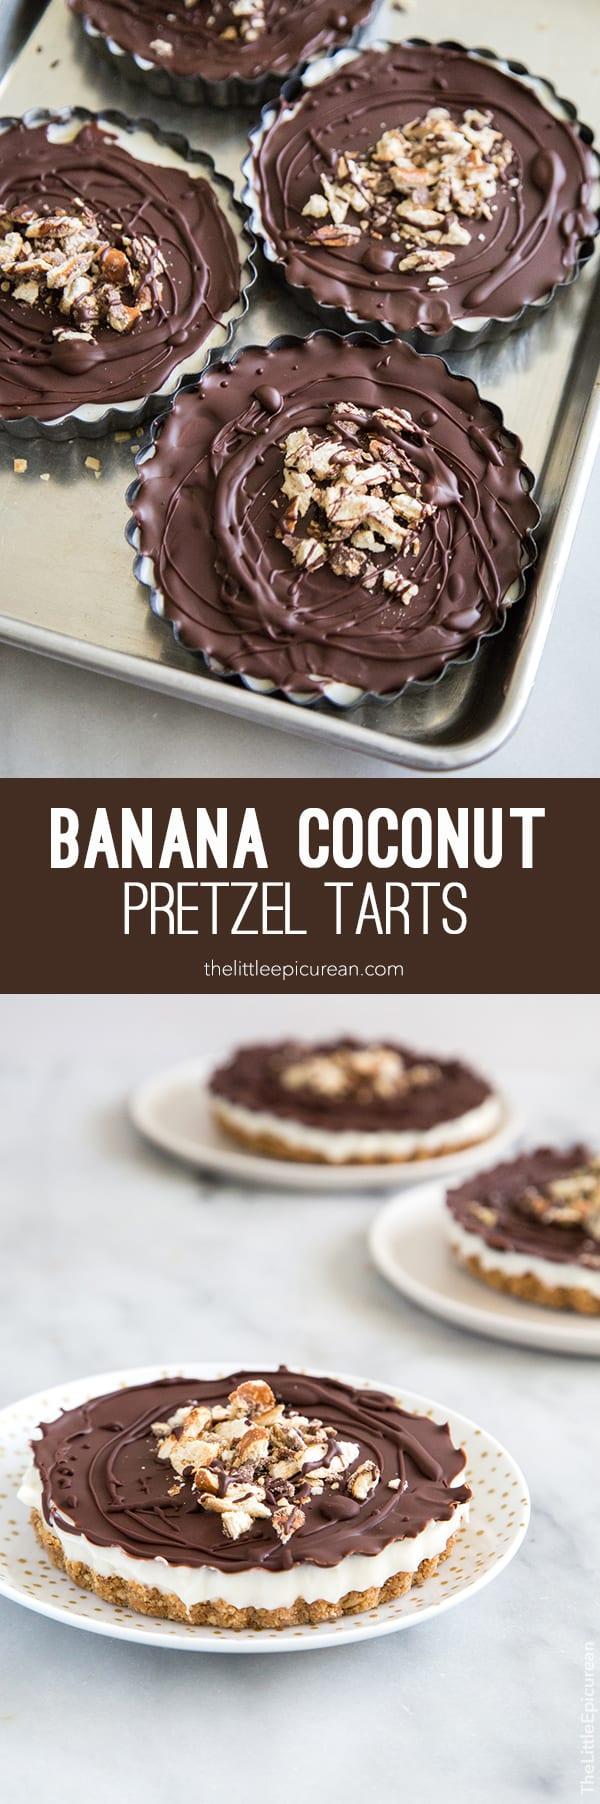 No Bake Banana Coconut Pretzel Tarts